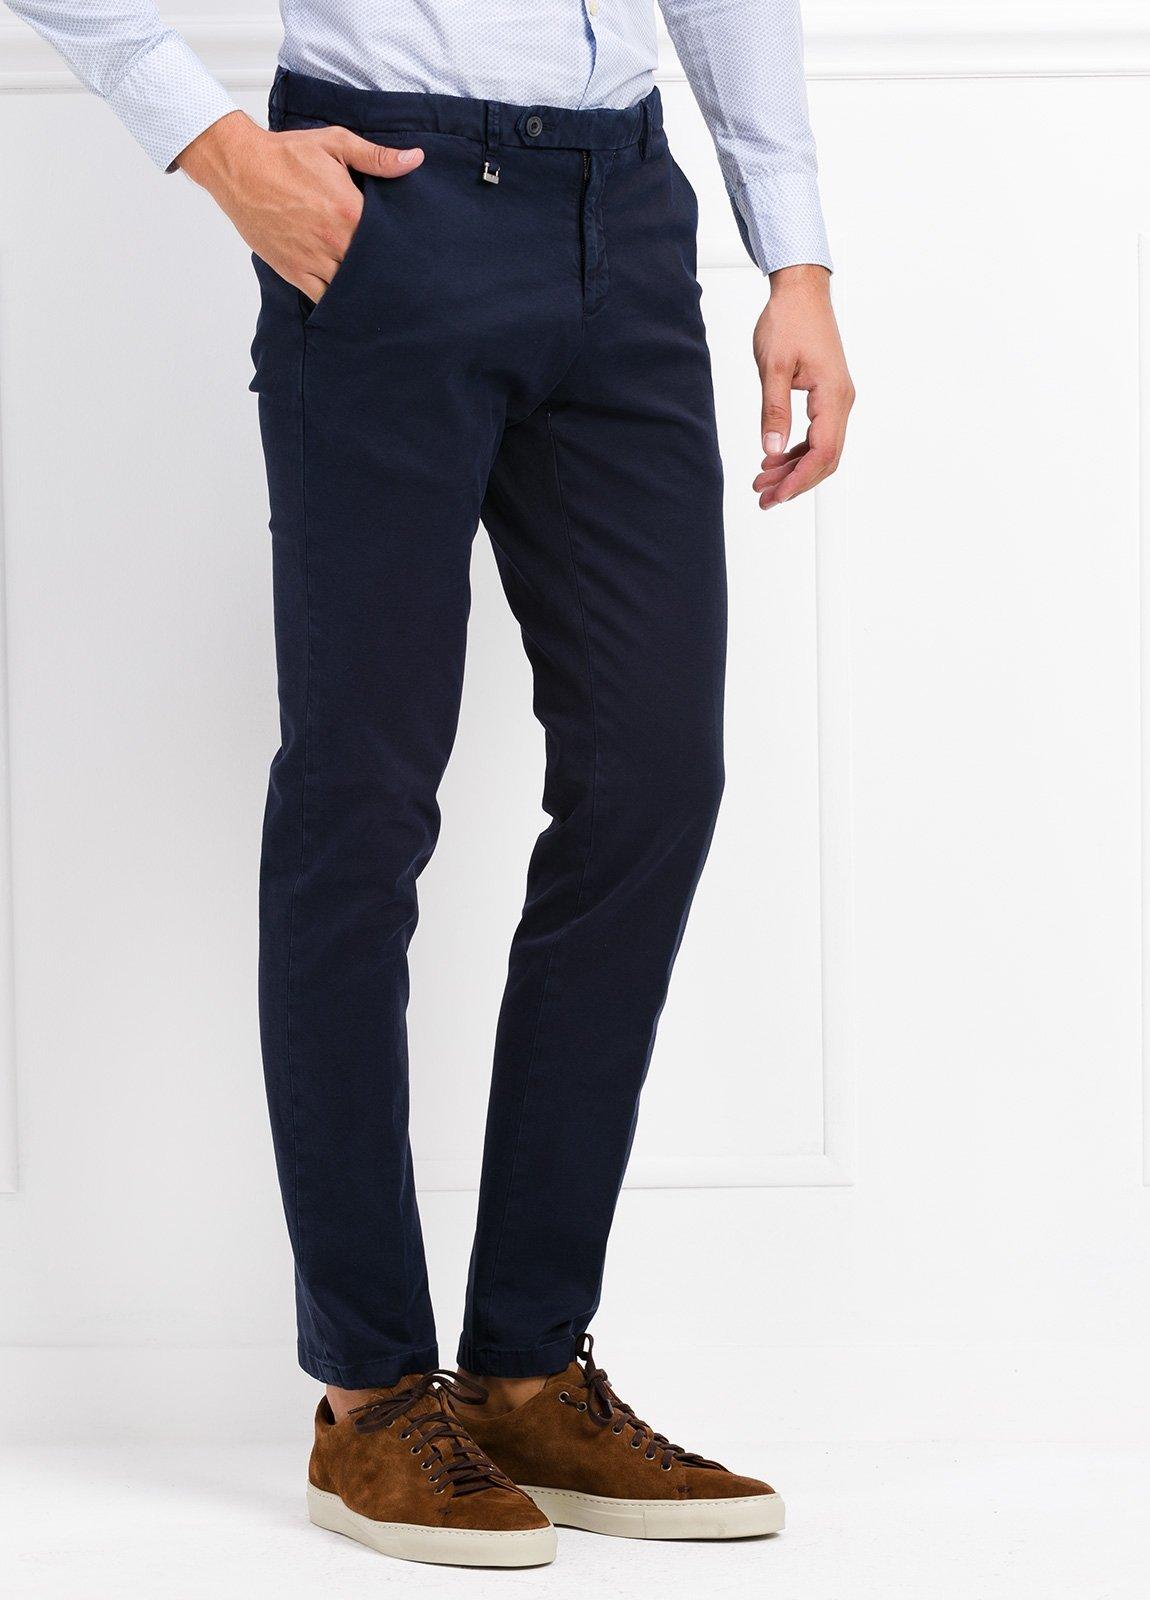 Pantalón modelo slim fit color azul marino. 97% Algodón 3% Ea. - Ítem1